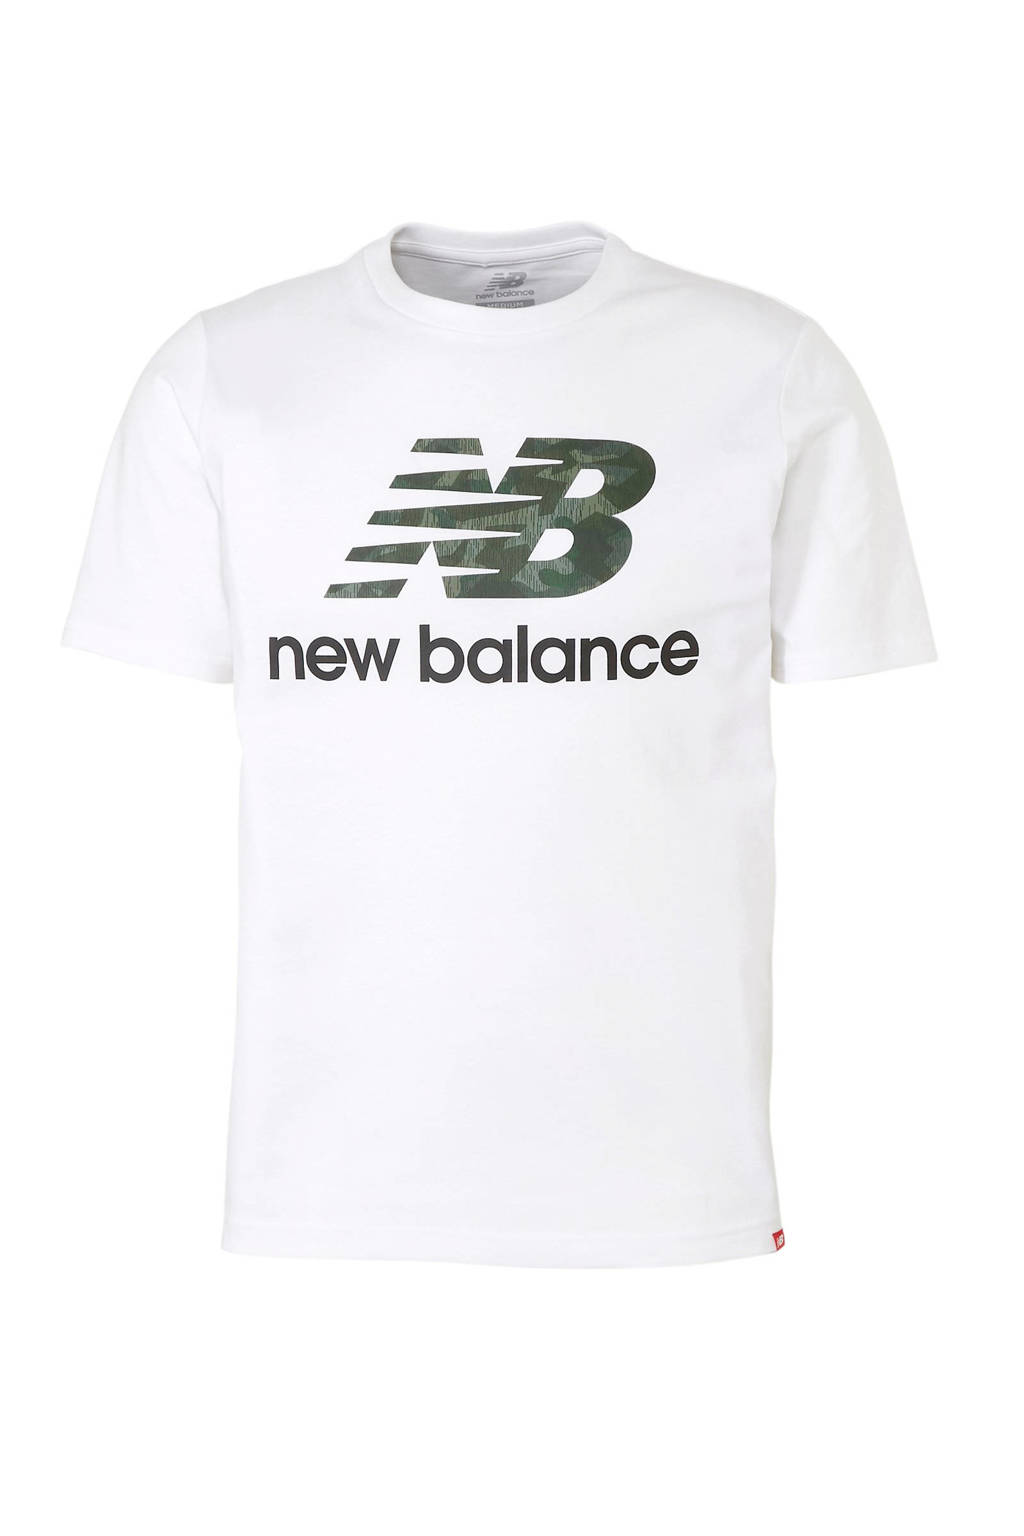 New Balance   T-shirt met printopdruk wit/groen, Wit/groen